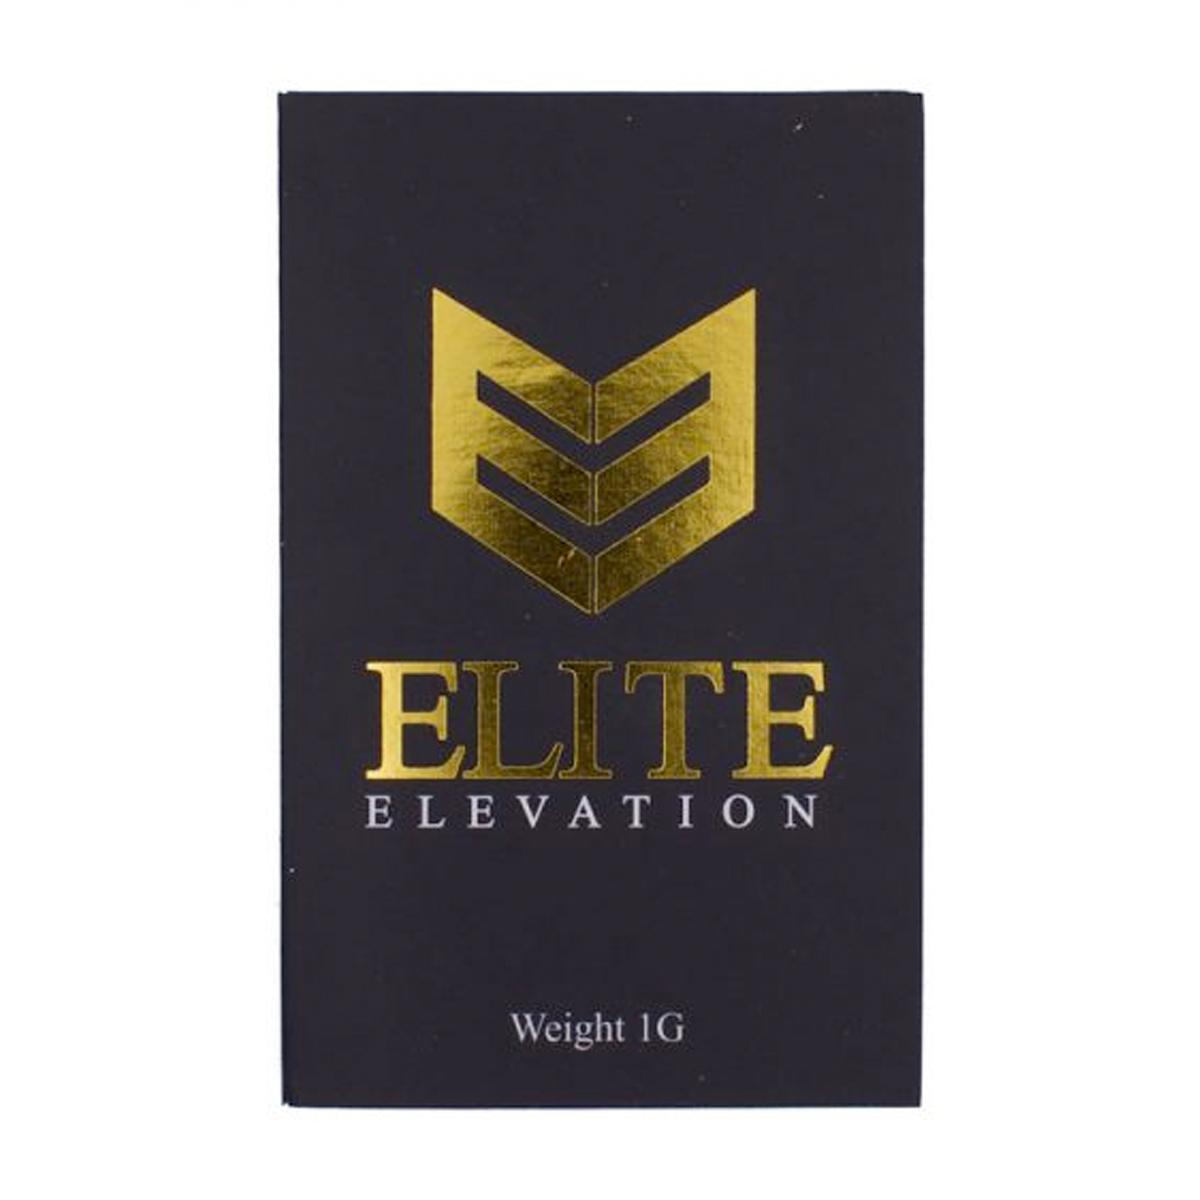 Buy Elite Elevation Shatter Online in Canada